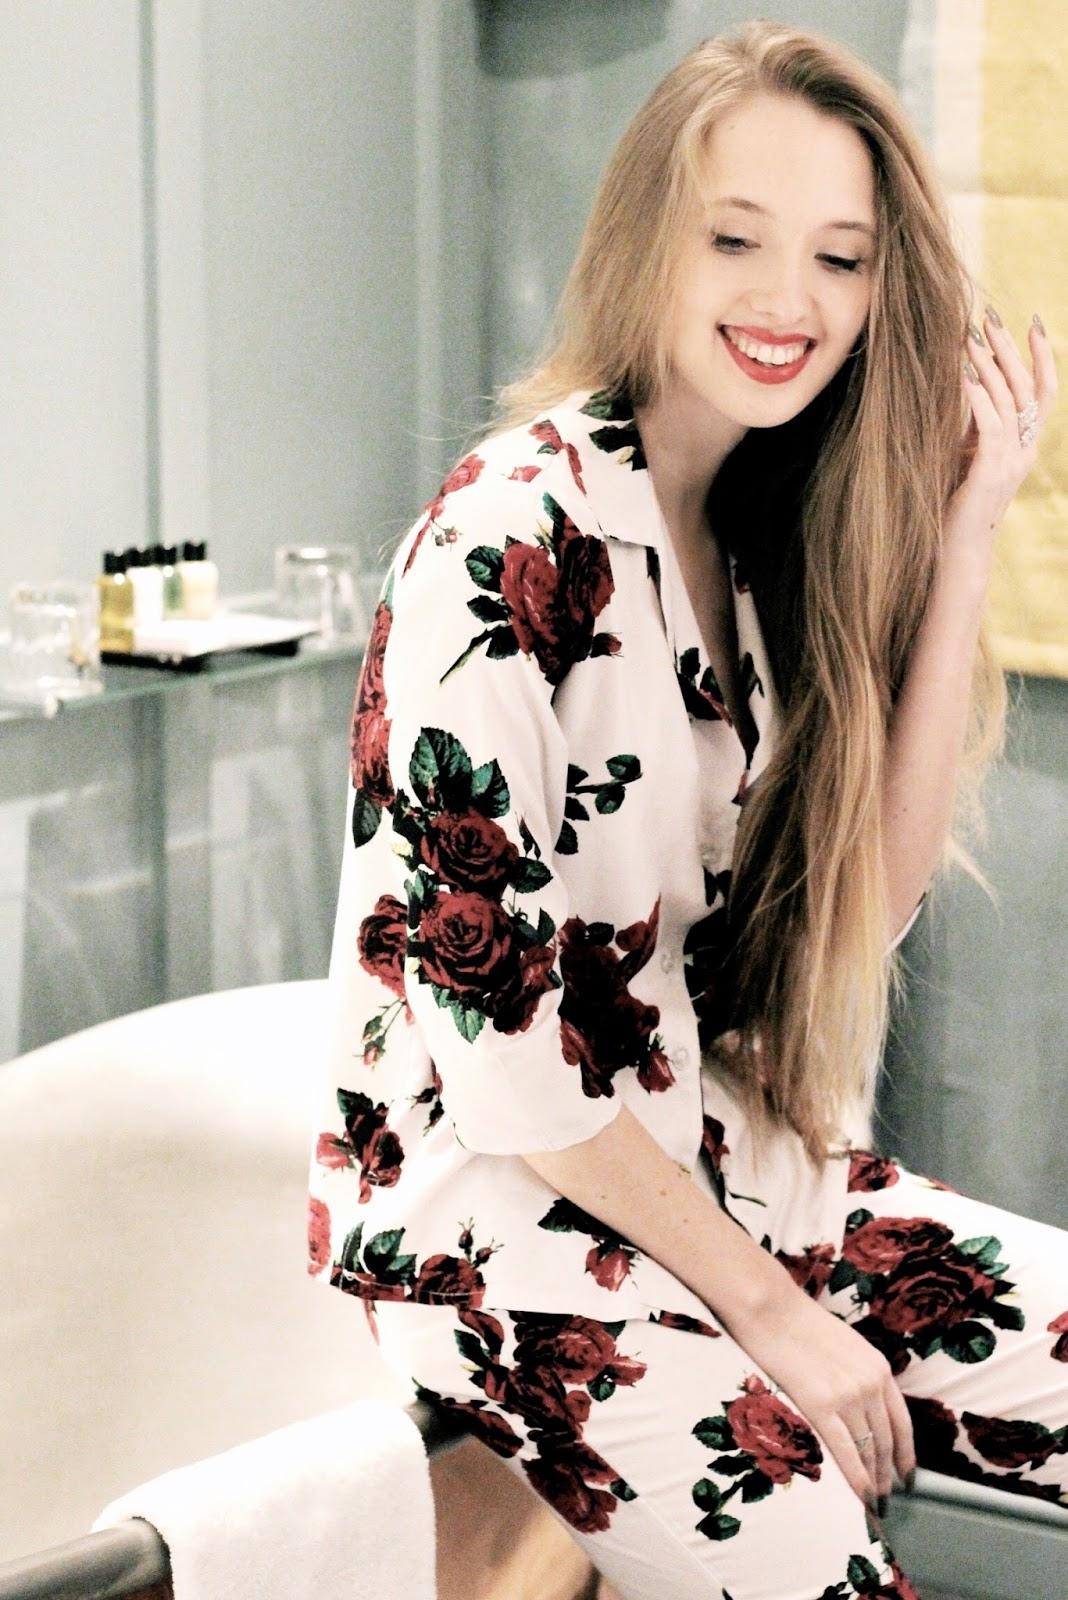 Romantic womens pyjamas for Valentine's Day